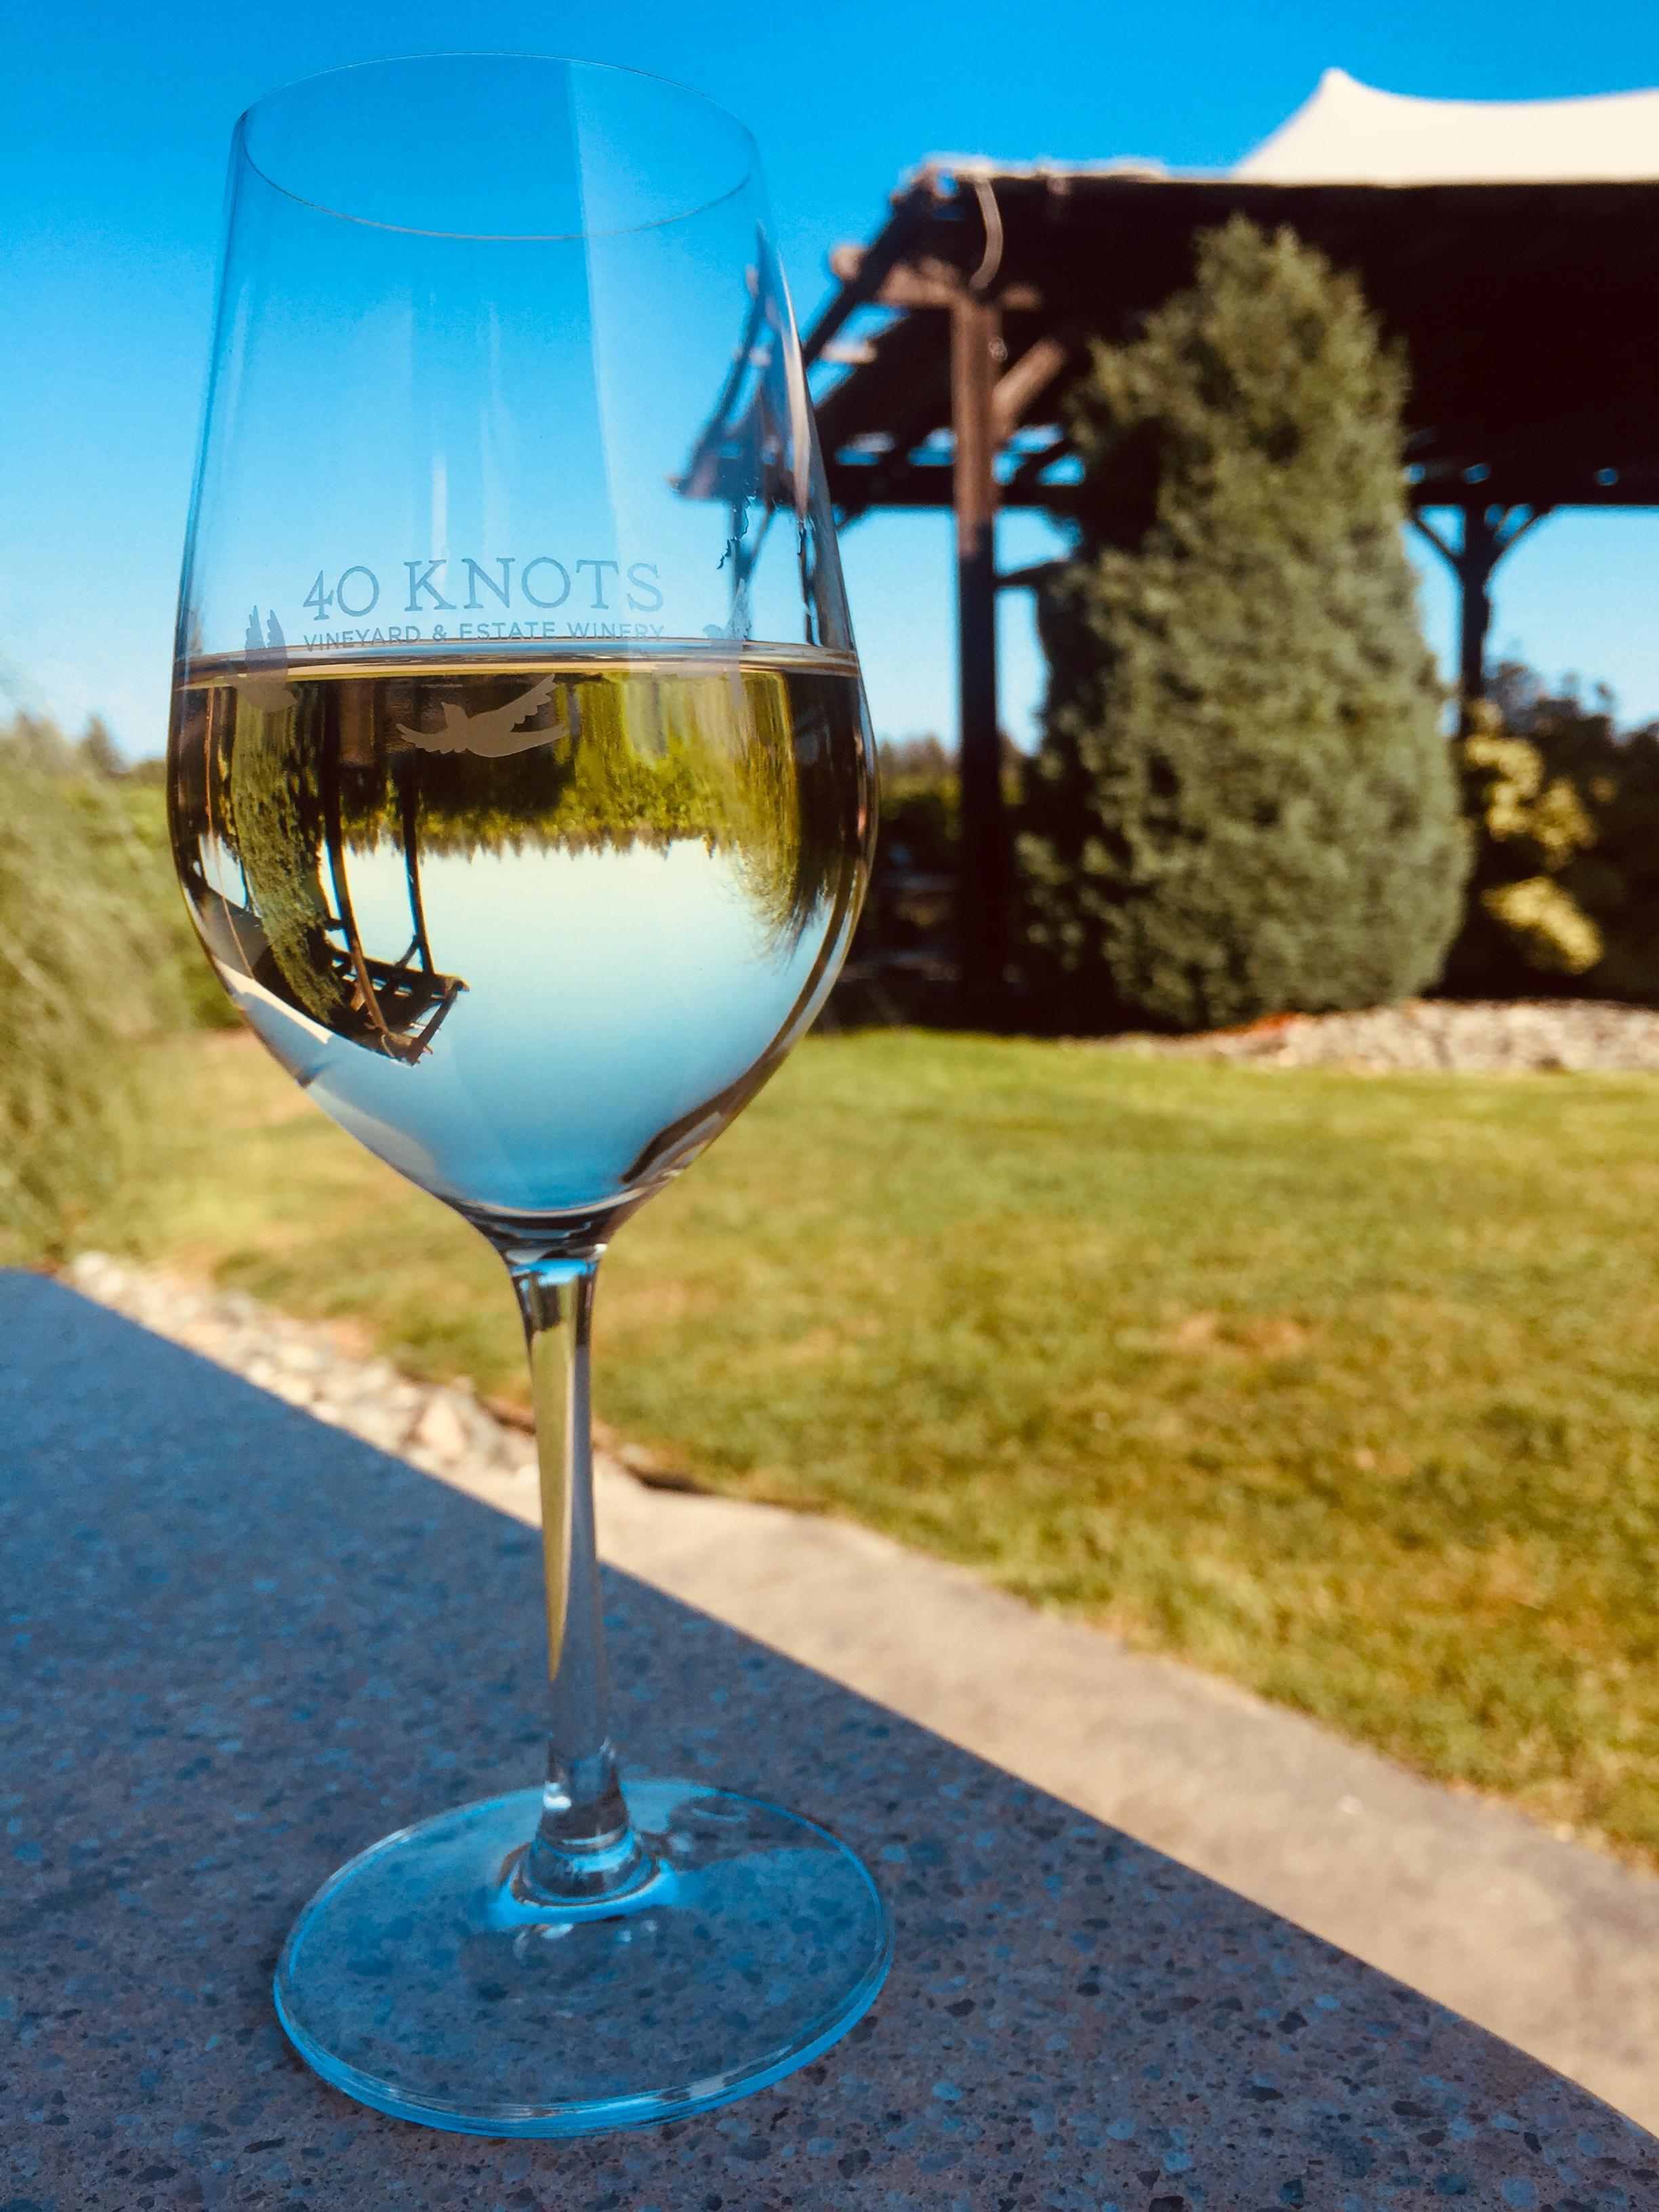 40 Knots Vineyard and Estate Winery Inc - News